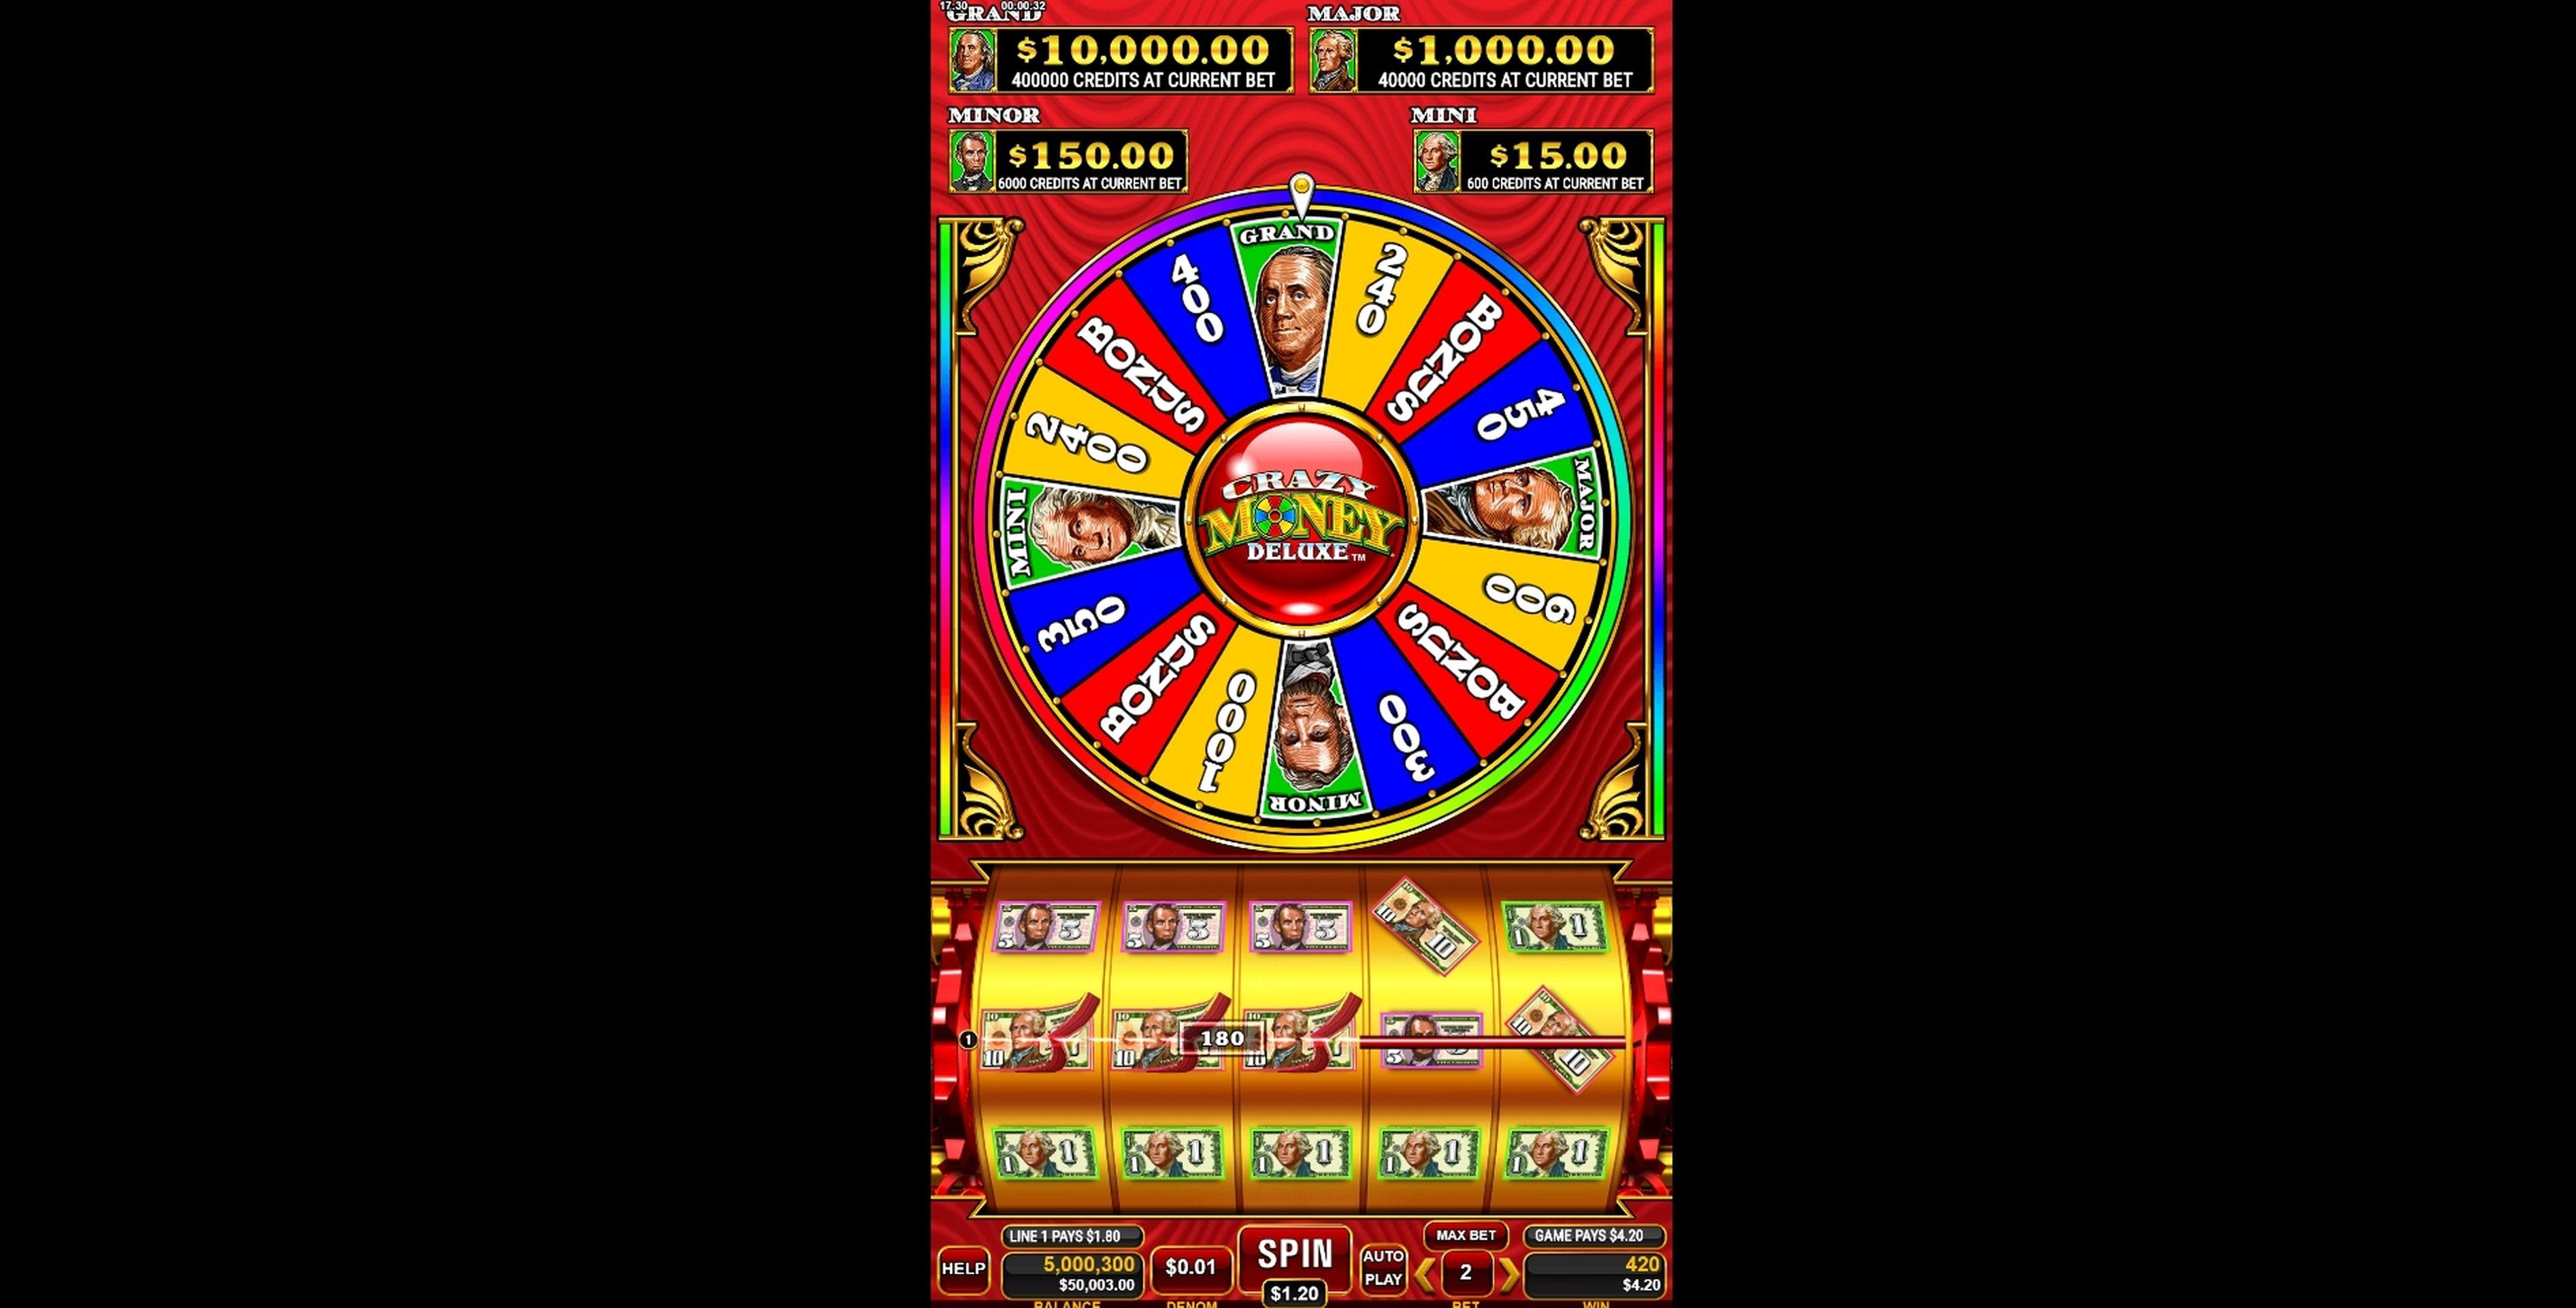 Slot Machine Deluxe Coins